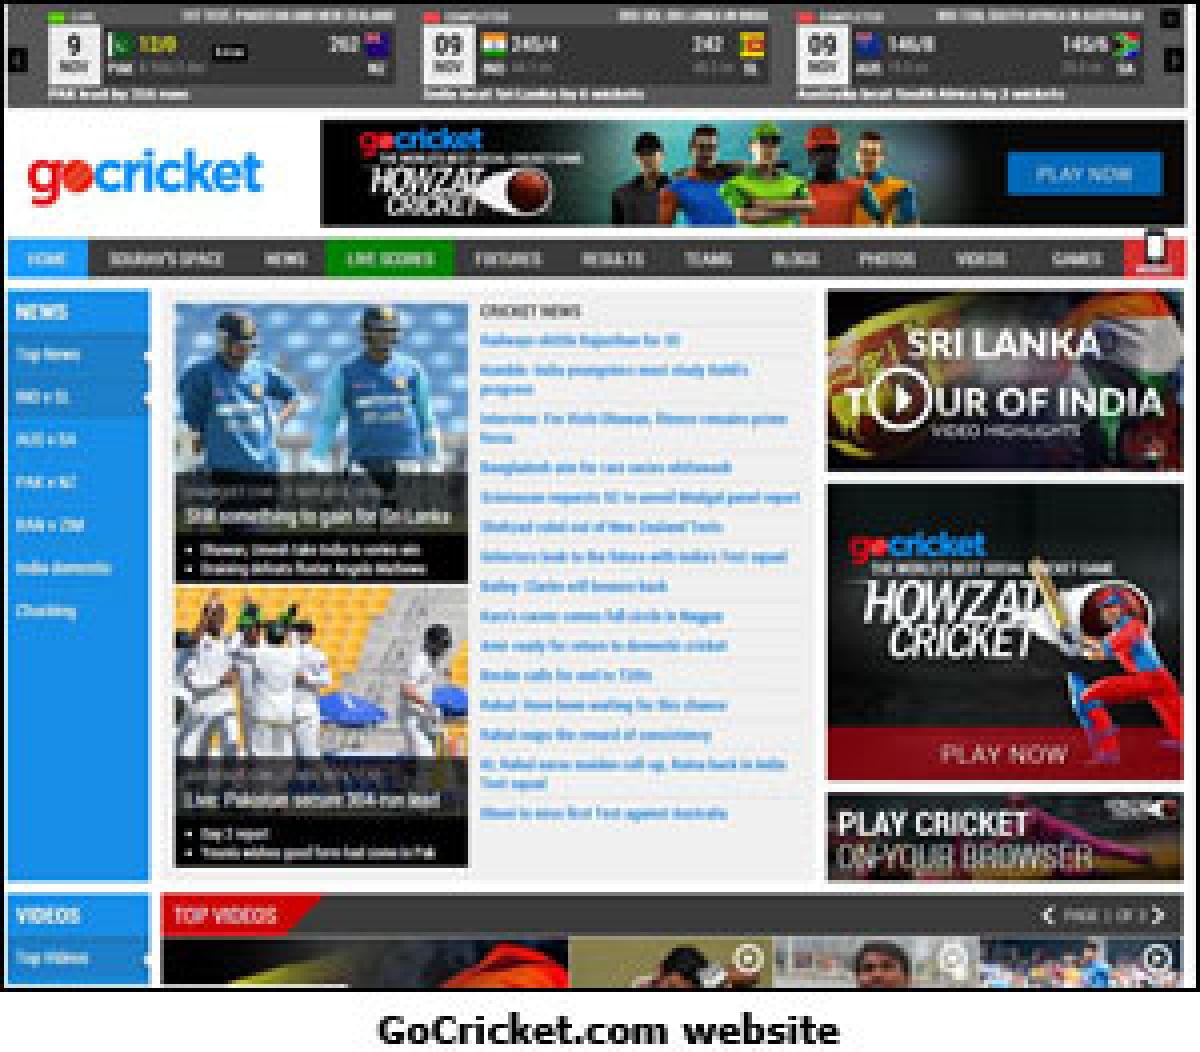 Times Internet acquires Cricbuzz.com